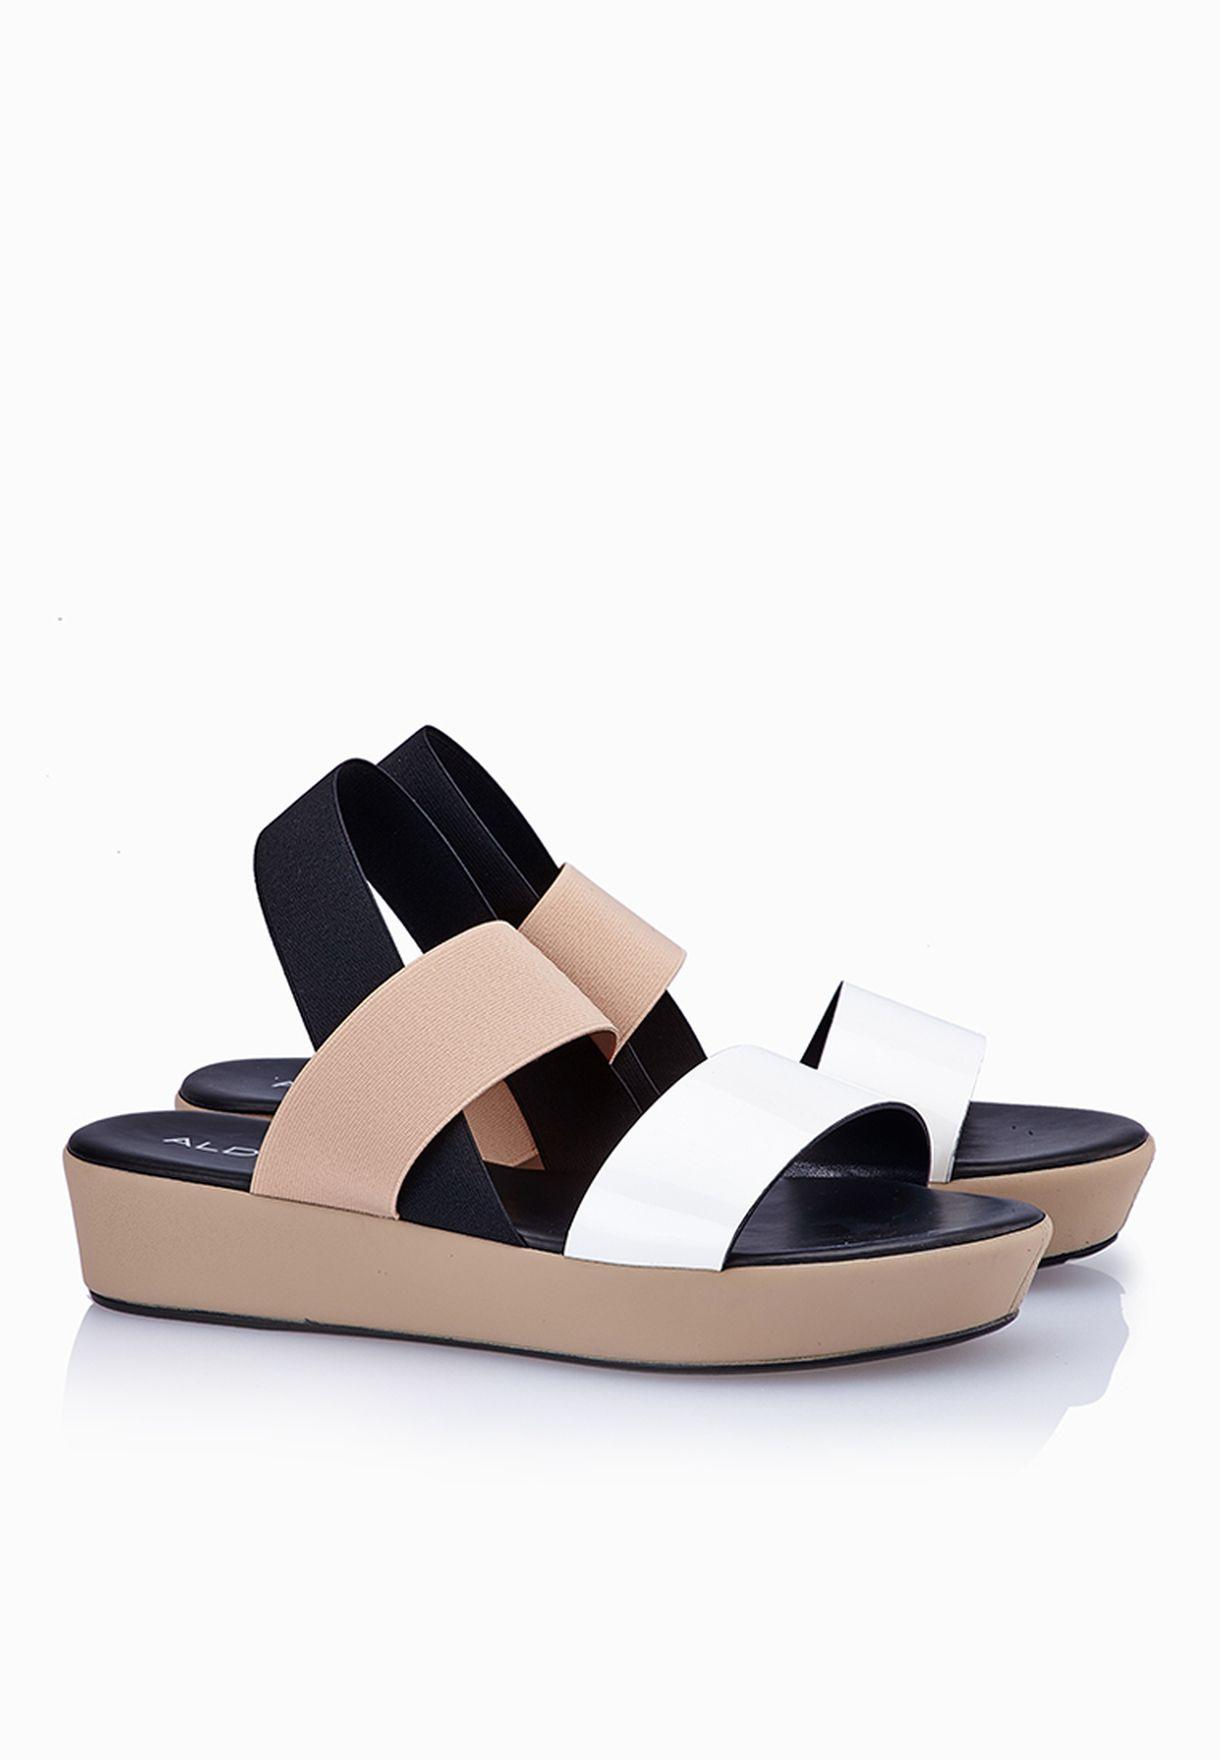 16e4d53c9b3c Shop Aldo multicolor Zirawiel Wide Strap Sandals for Women in ...